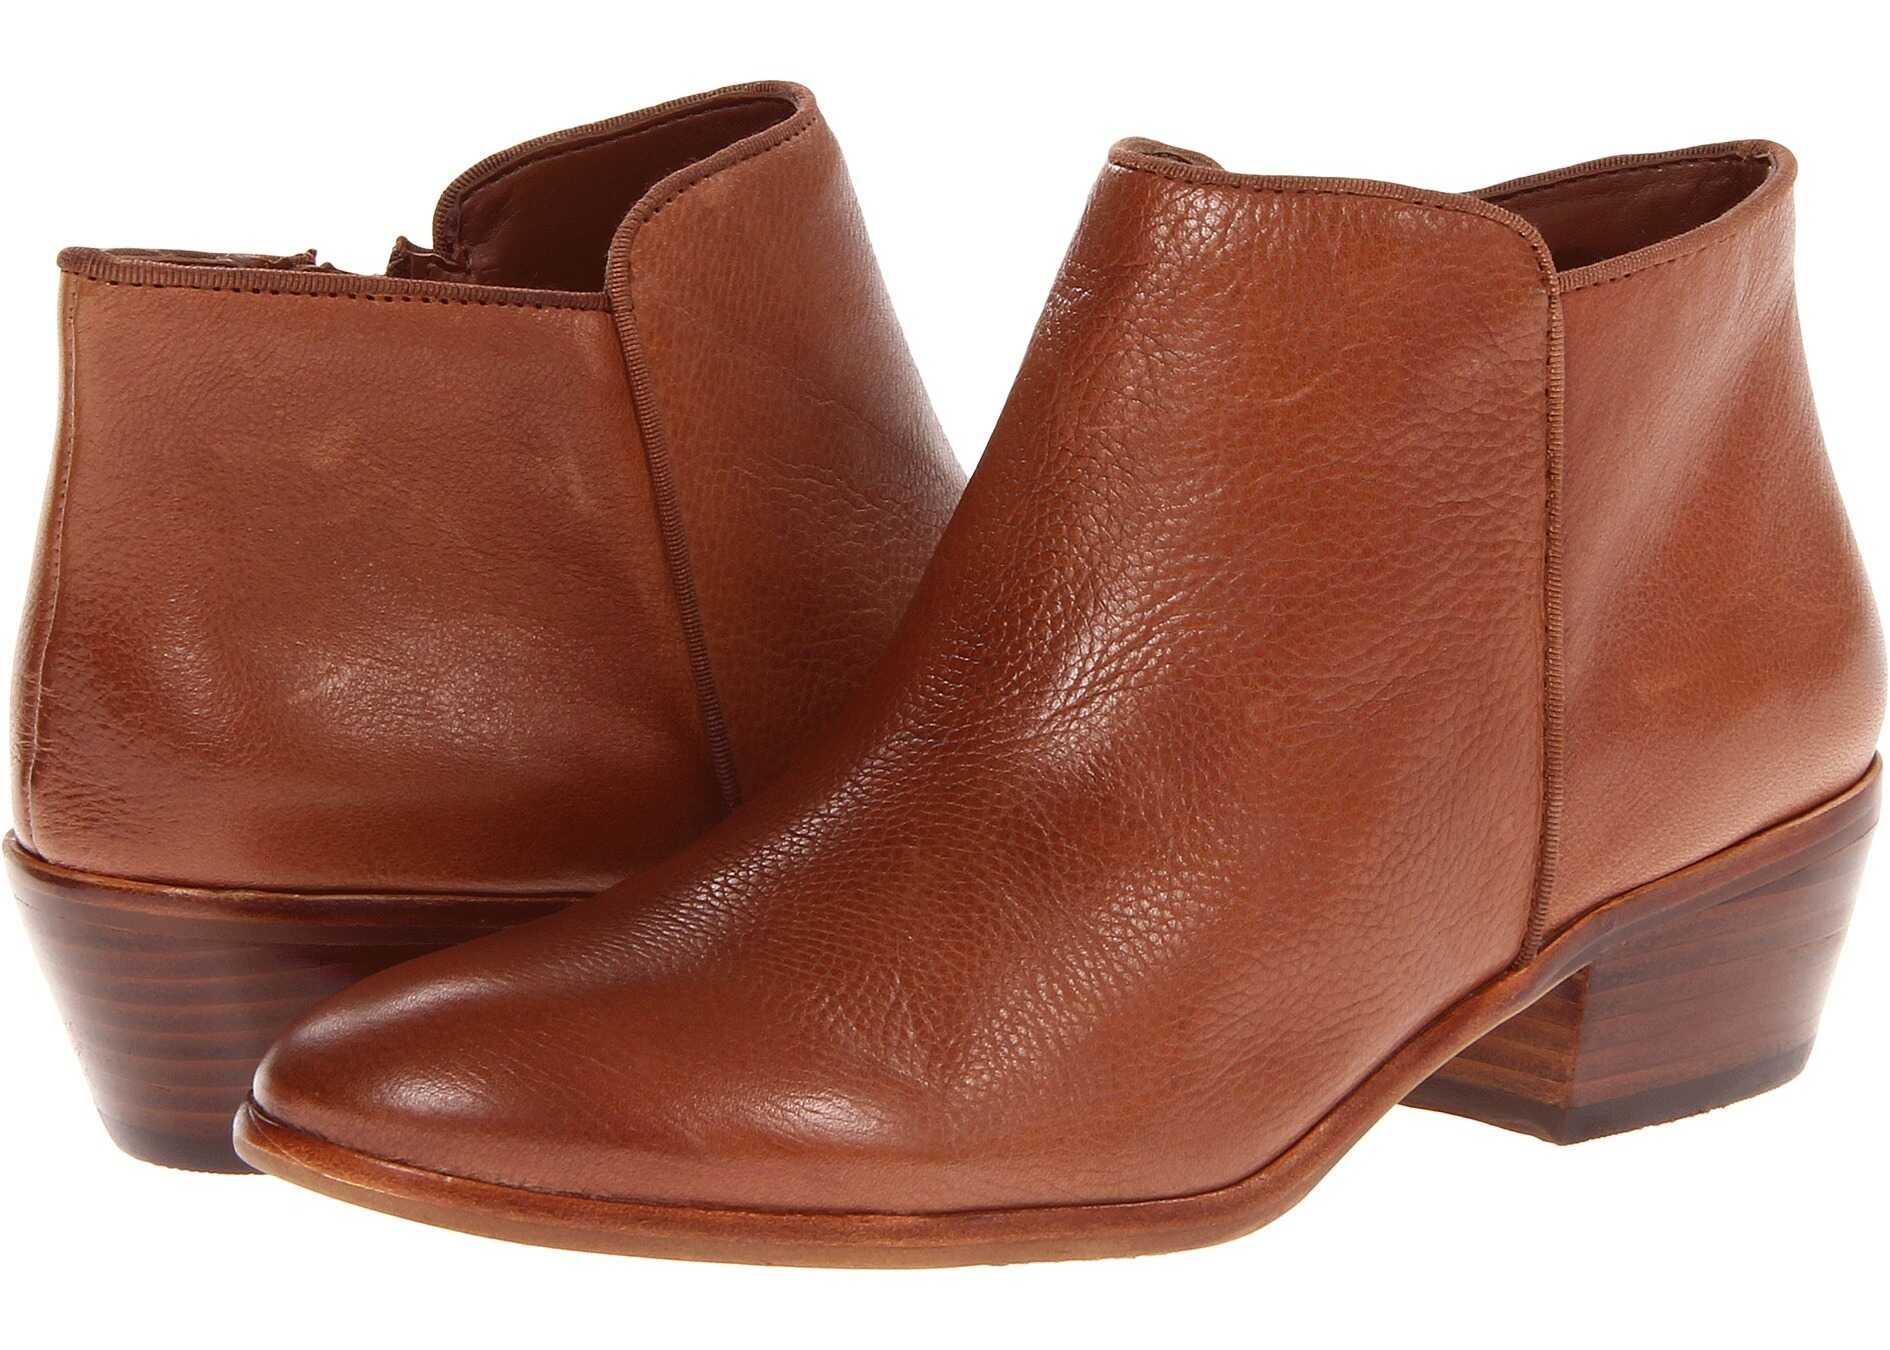 Sam Edelman Petty Saddle Leather 1